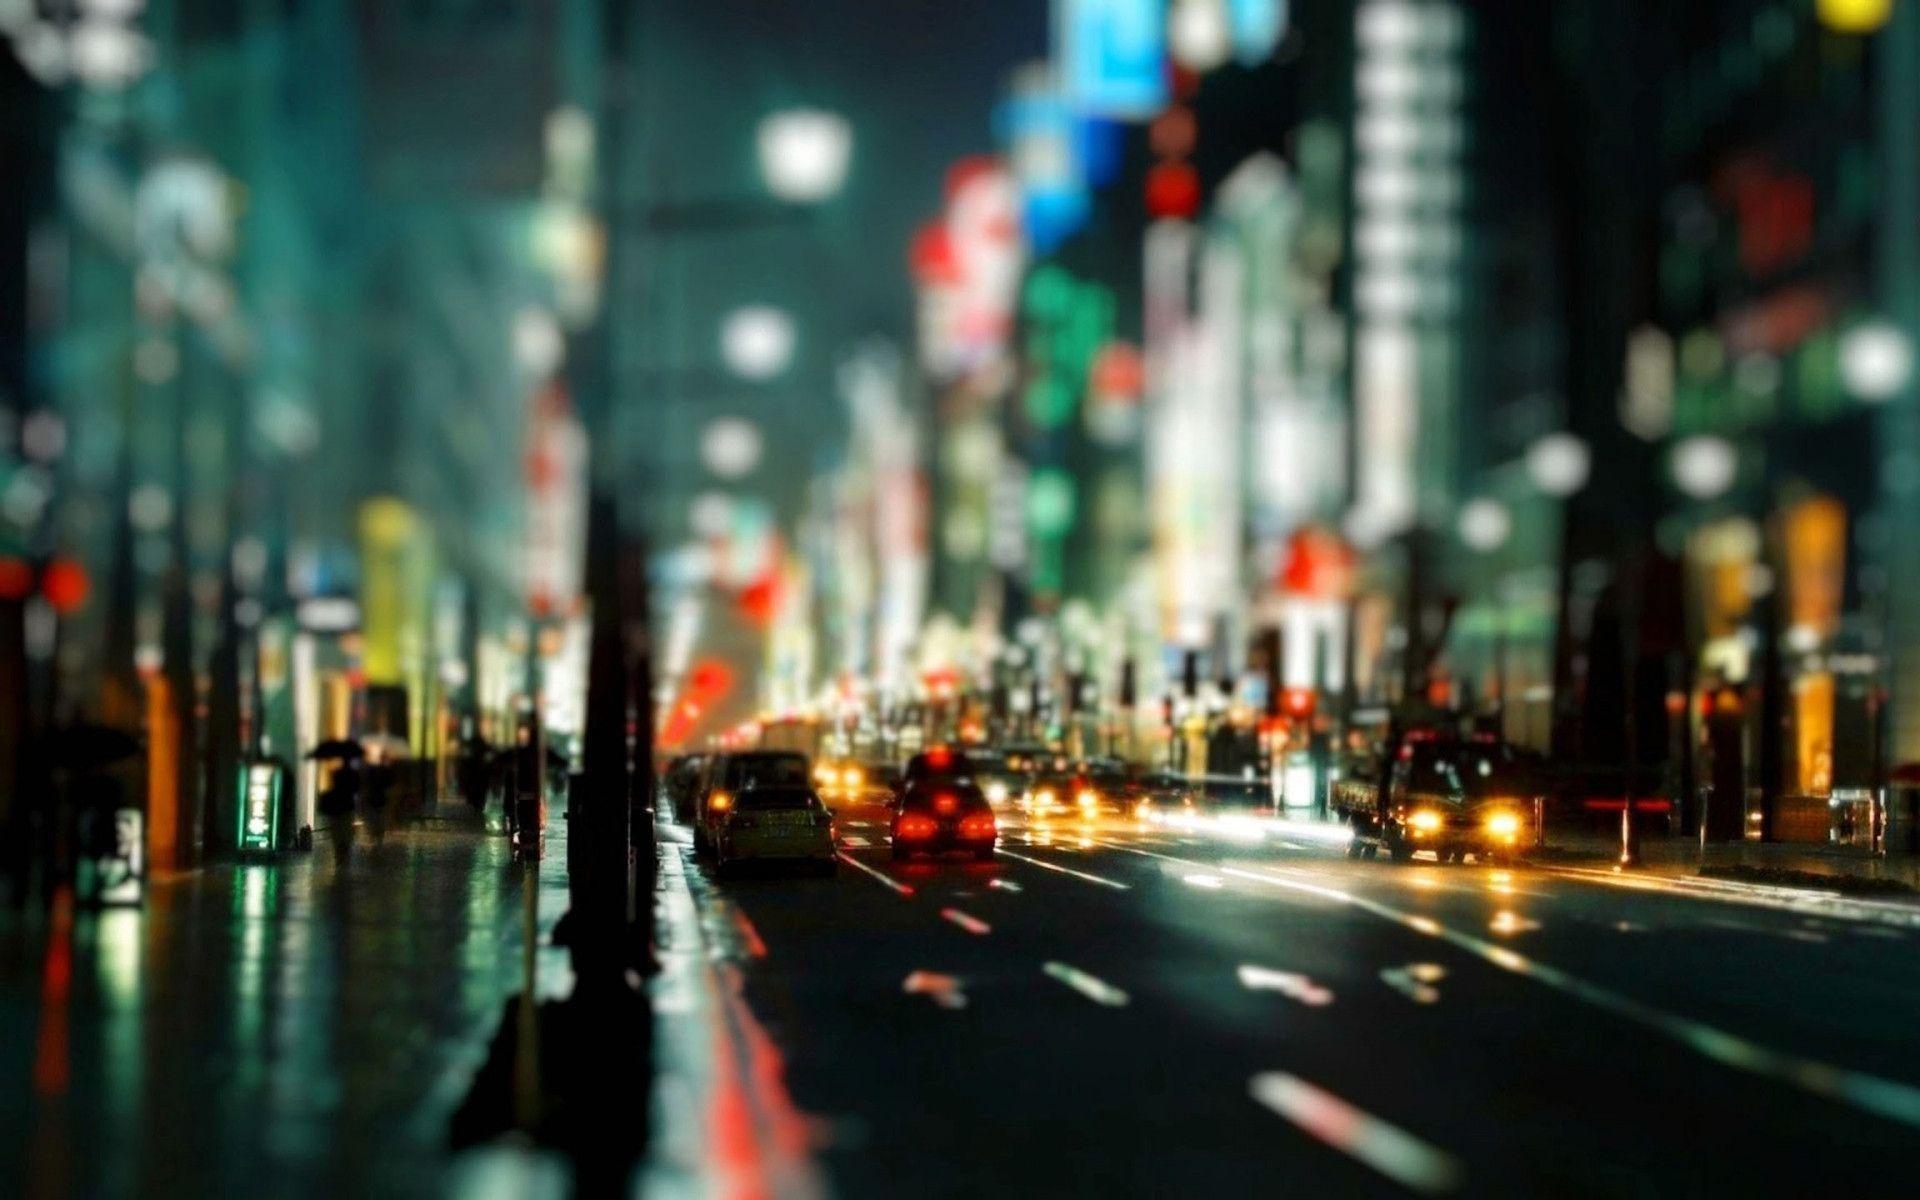 1920x1080 Wallpaper City Night Lights Buildings Sky